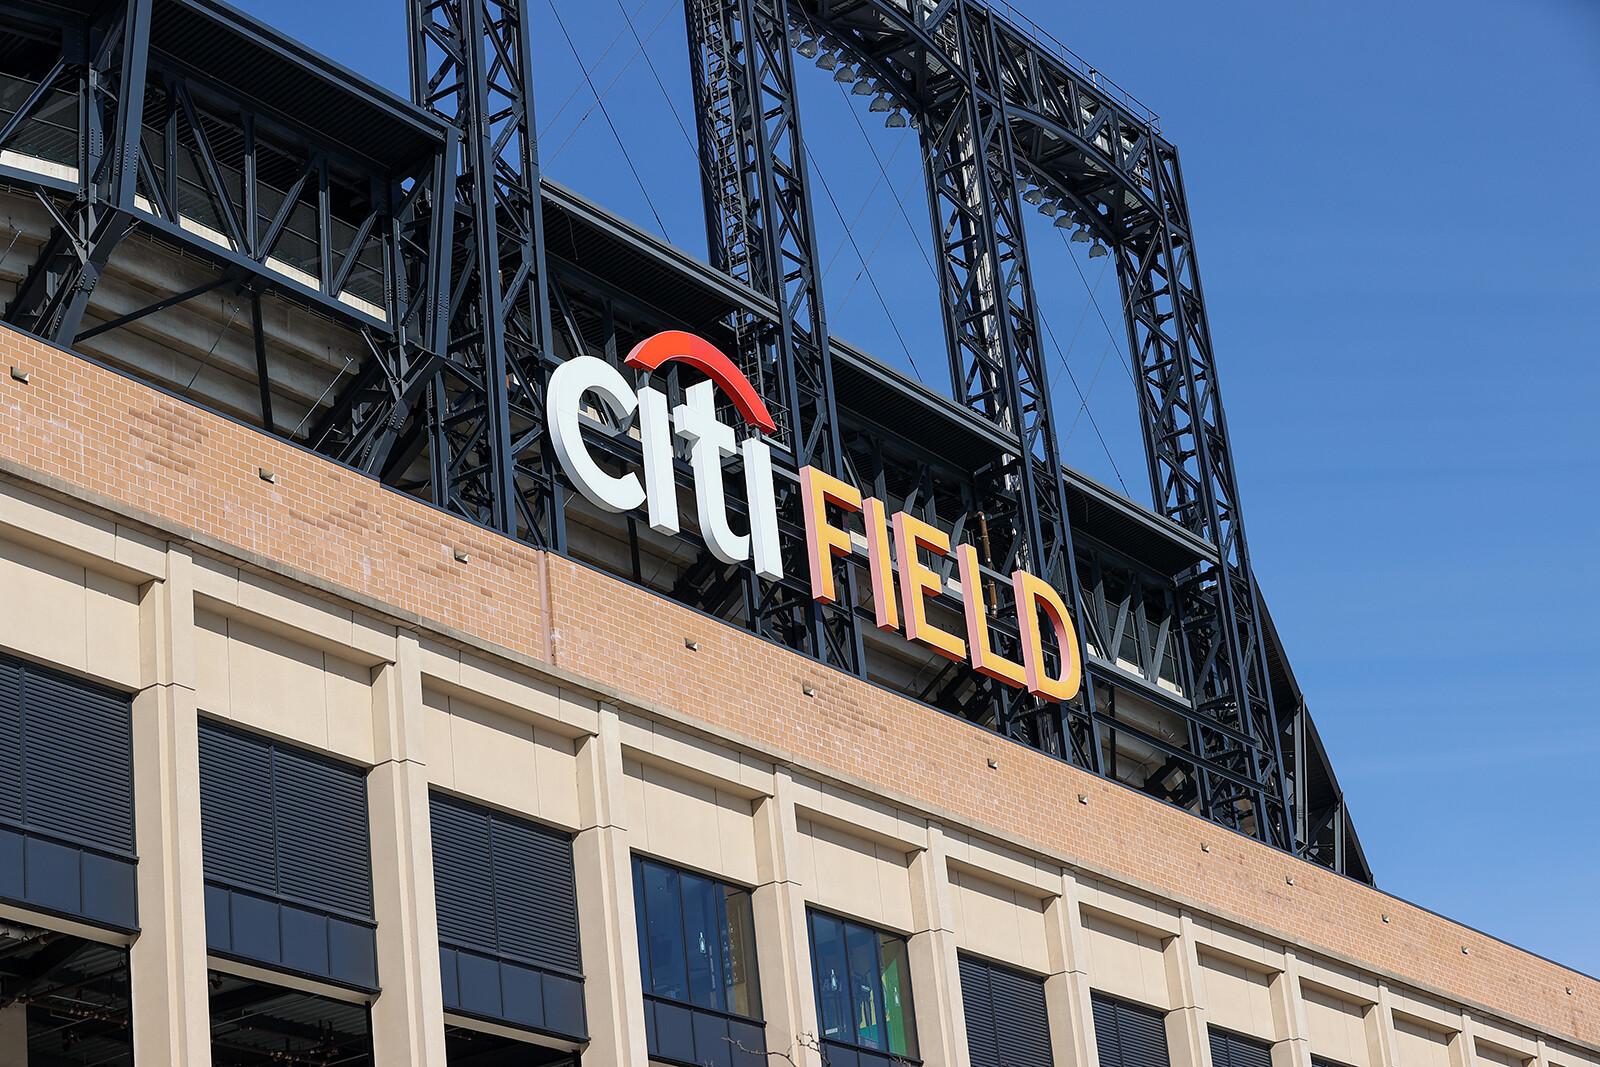 A man was found dead at New York's Citi Field baseball park